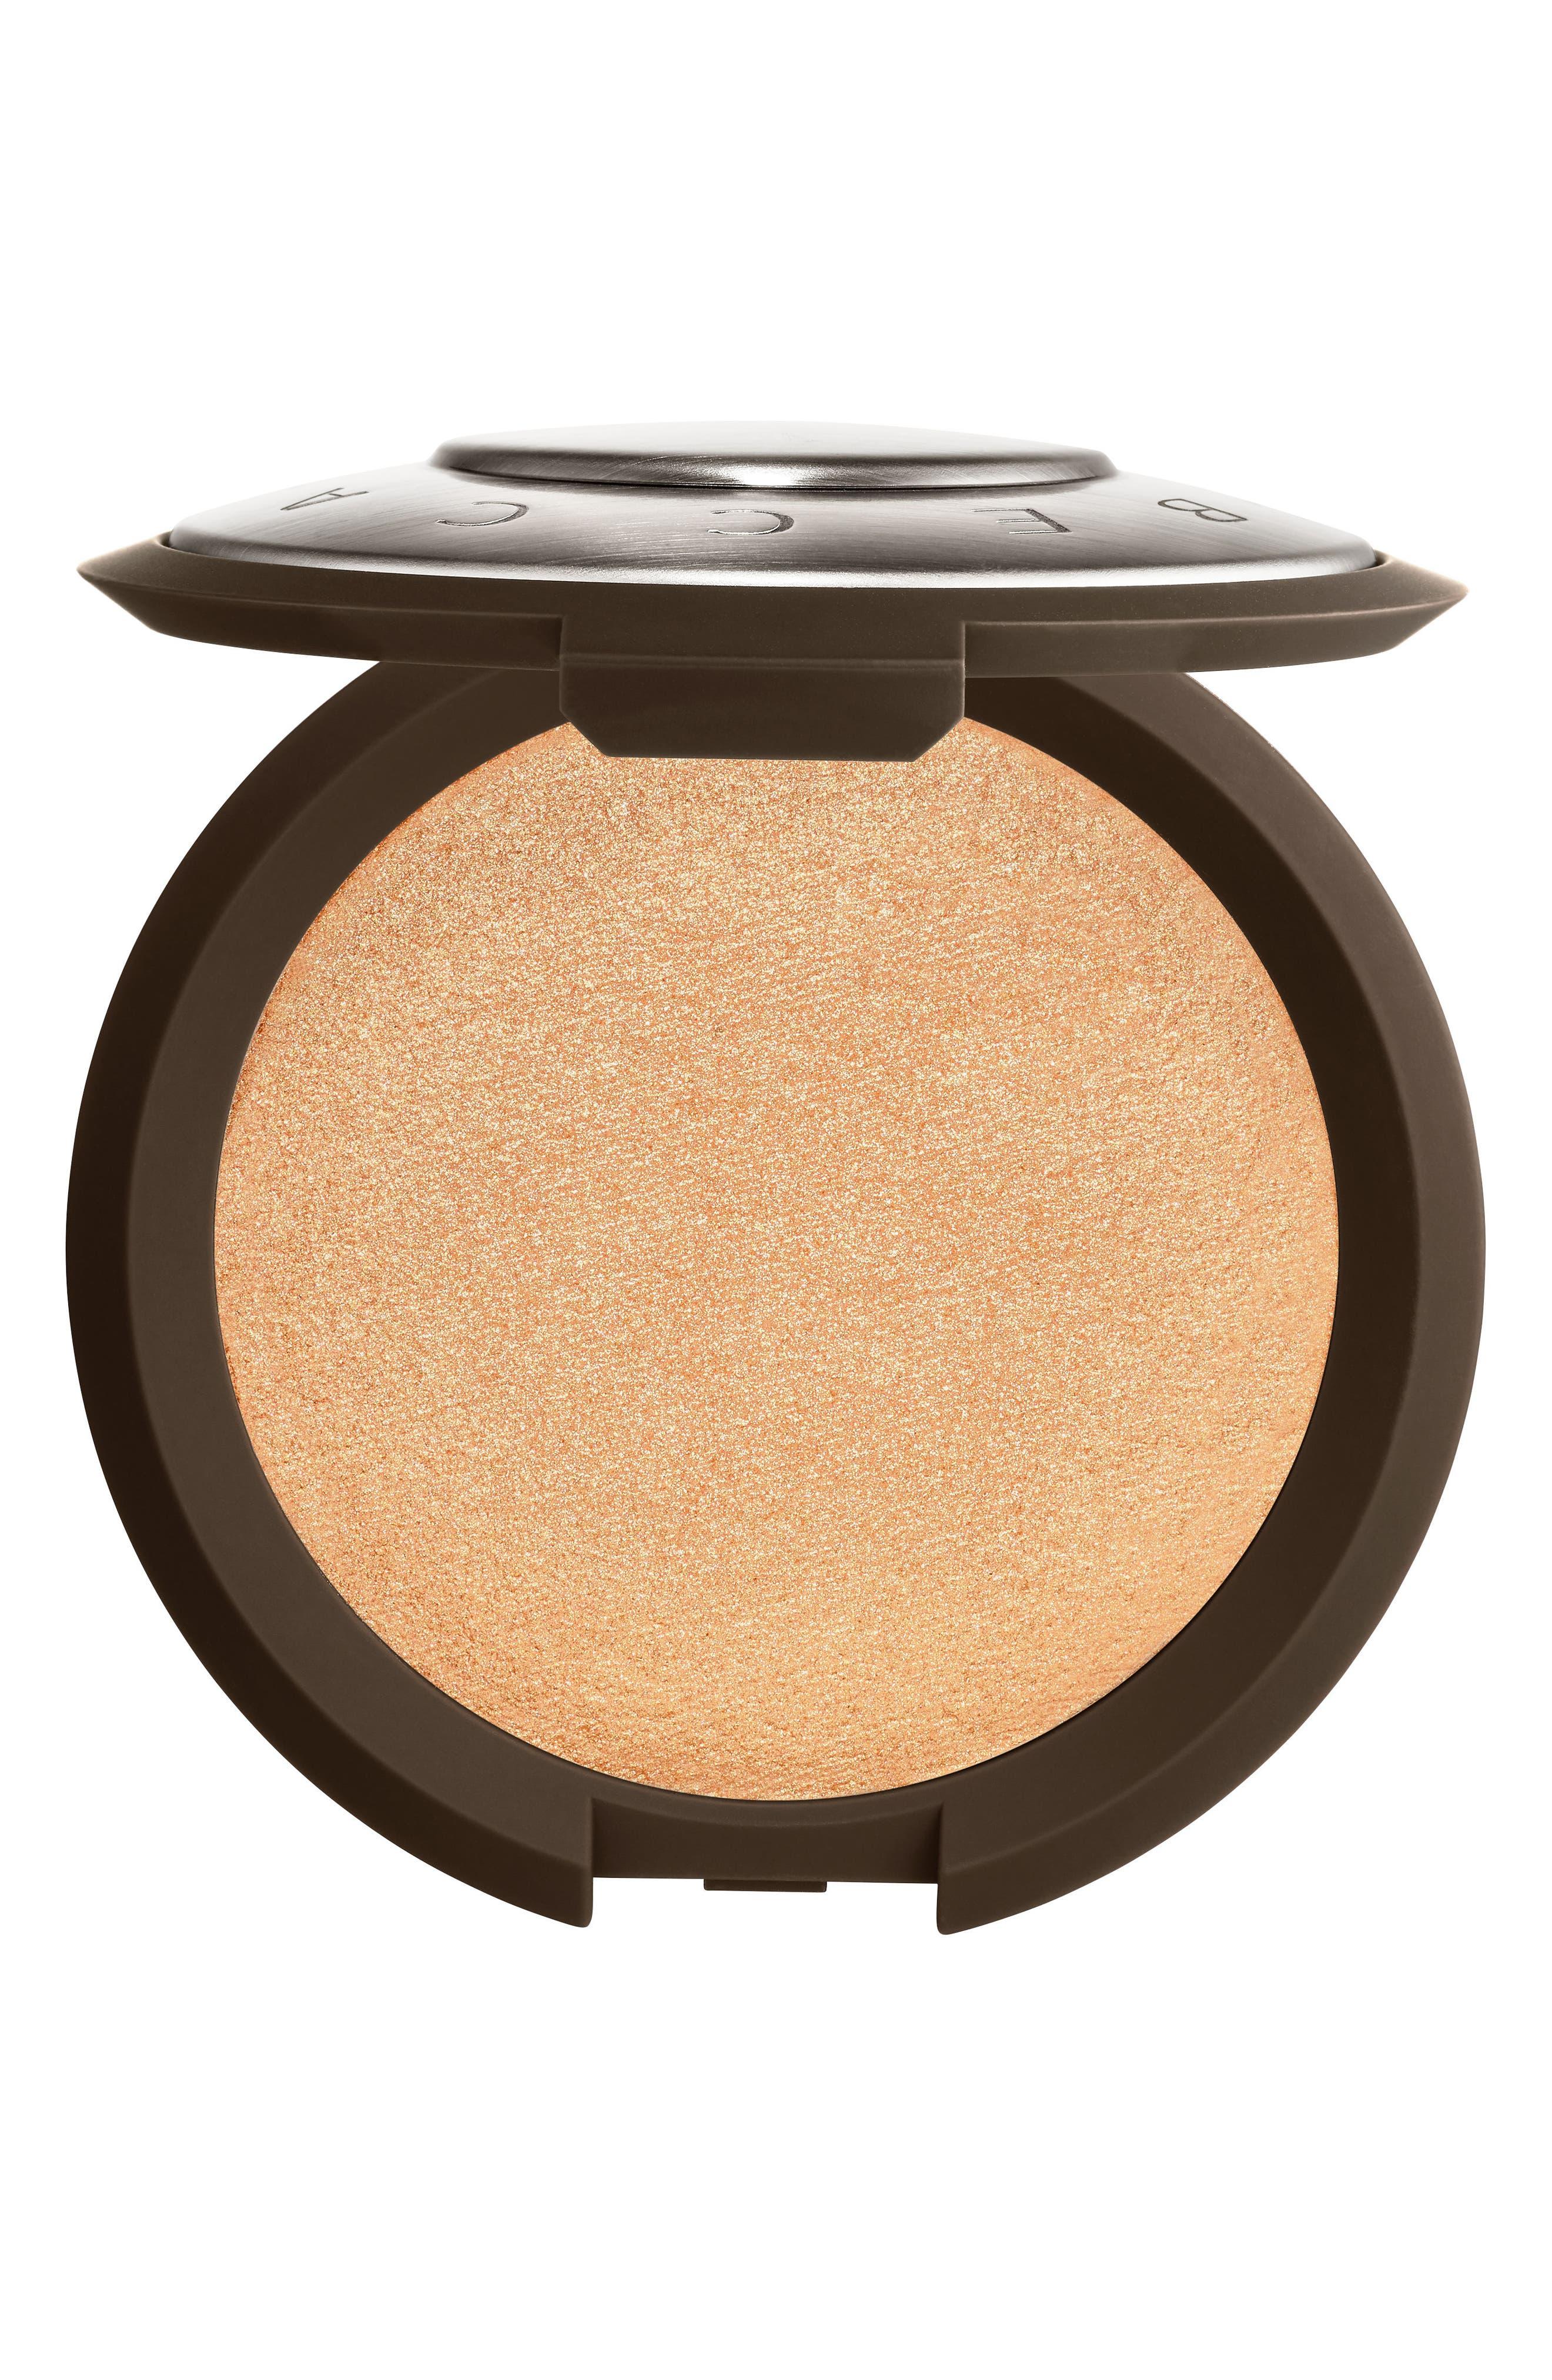 Alternate Image 1 Selected - BECCA Shimmering Skin Perfector Pressed Highlighter